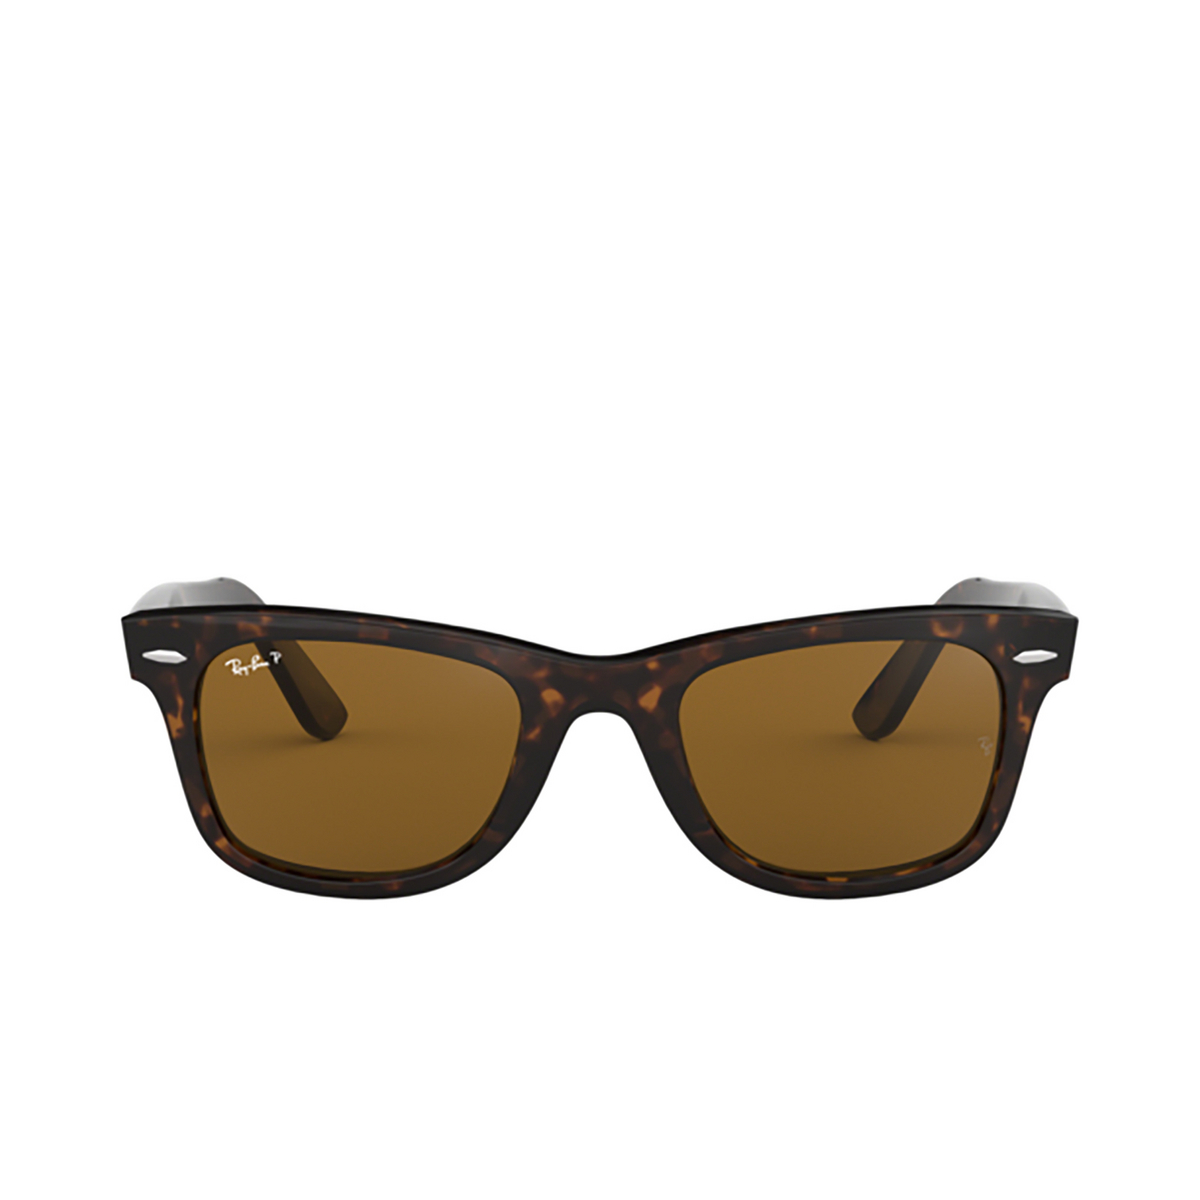 Ray-Ban® Square Sunglasses: Wayfarer RB2140 color Tortoise 902/57.